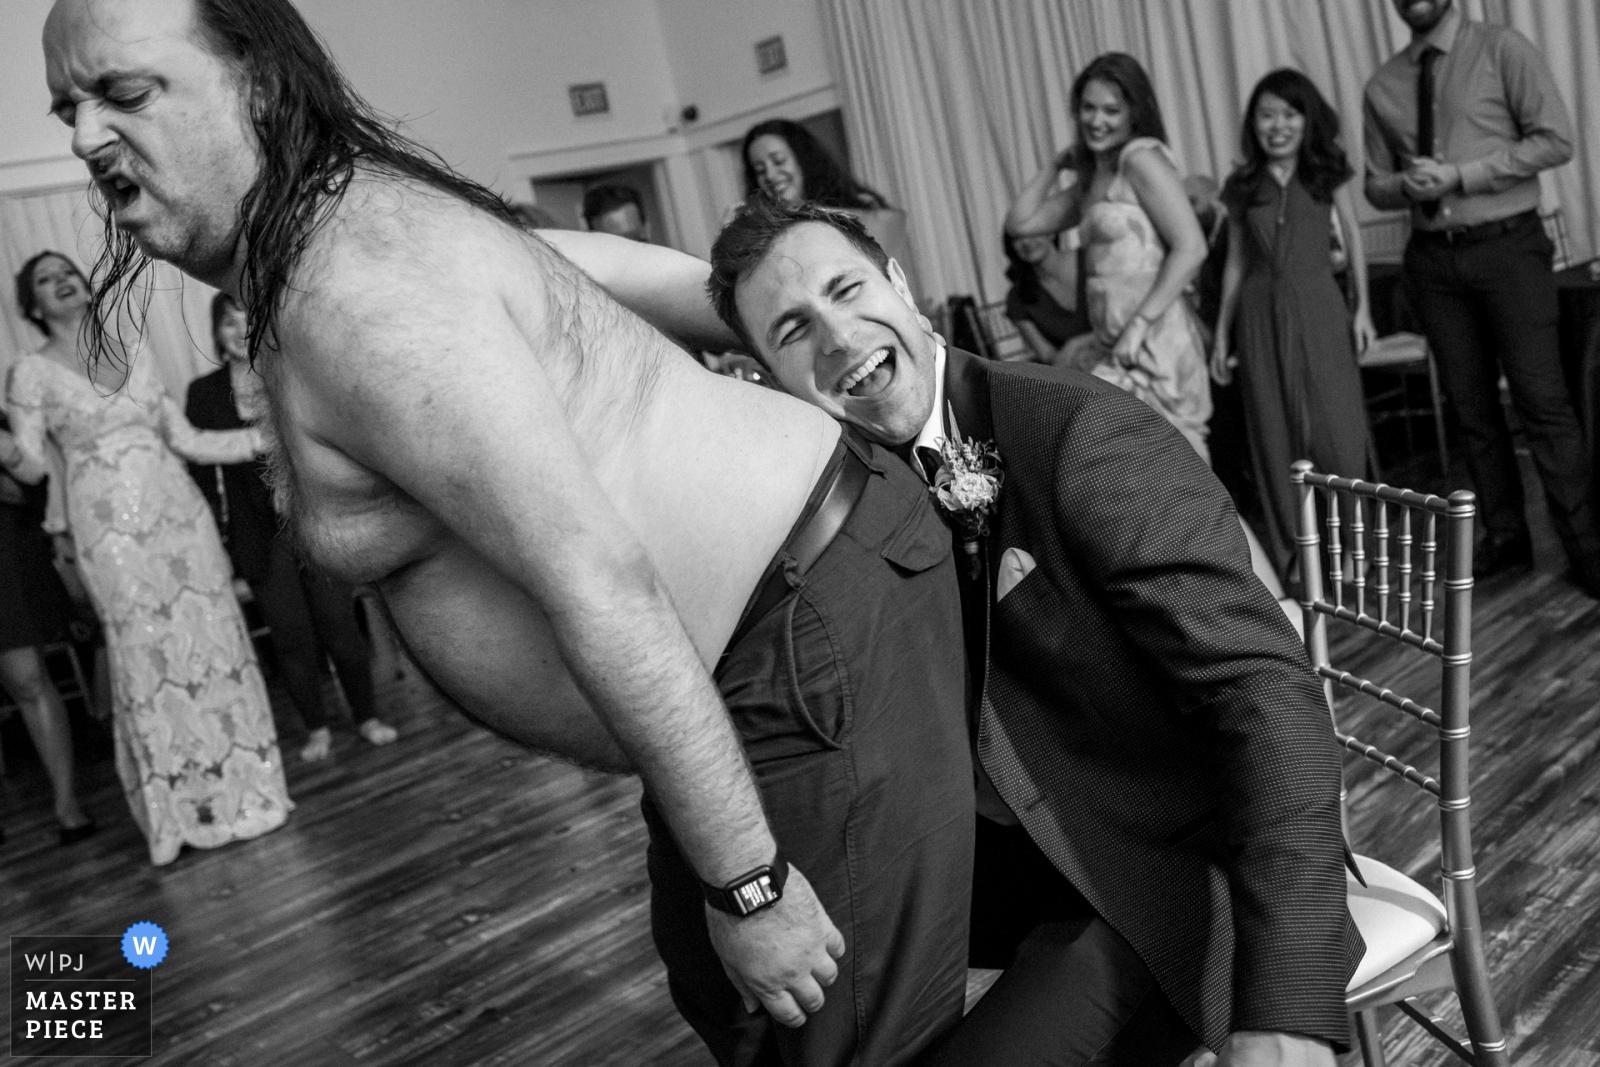 wpja Annie Bang Wedding Photojournalist Documantary Candid 3.jpeg